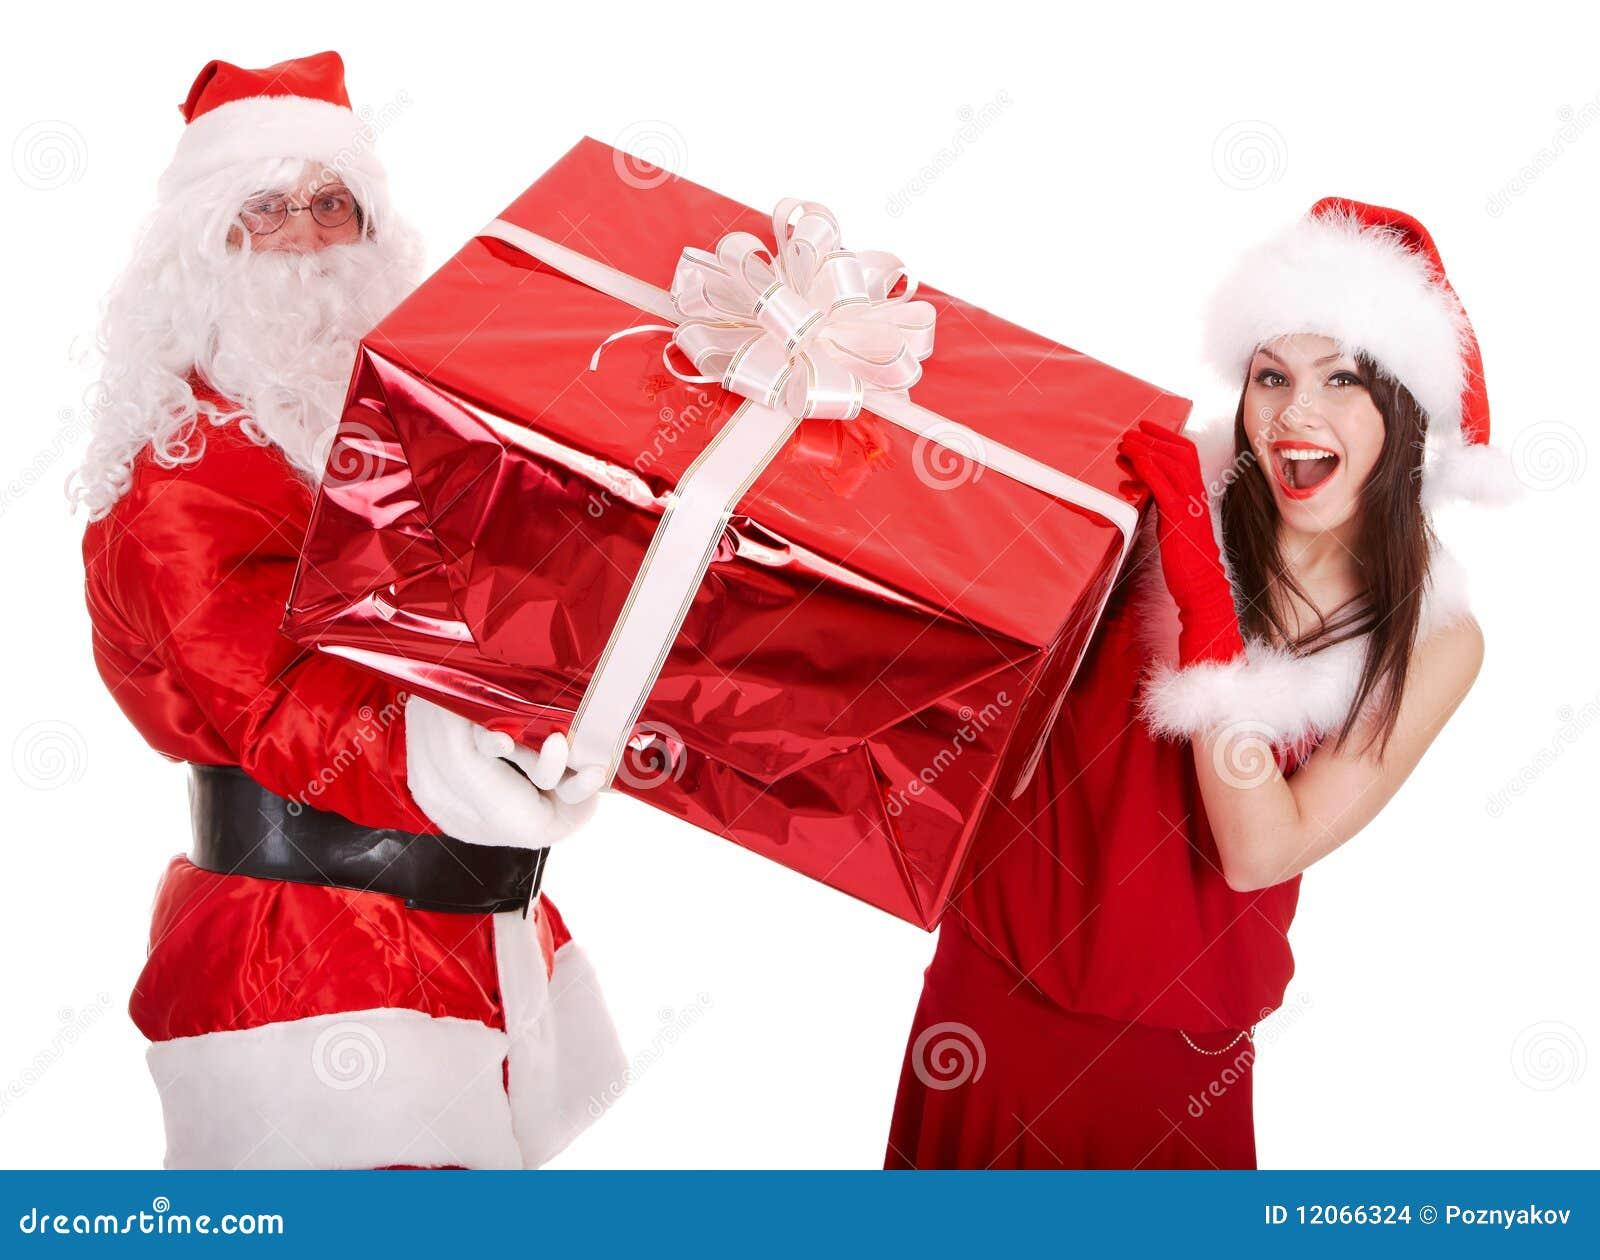 download santa claus and christmas girl with big gift box stock photo image of - Big Christmas Gifts